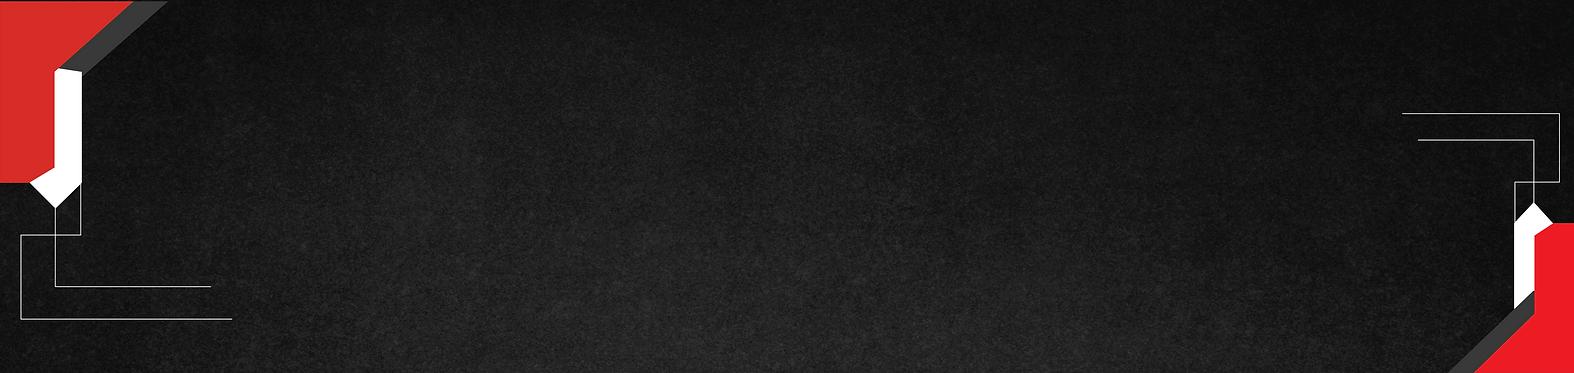 fondo negro 2-04.png